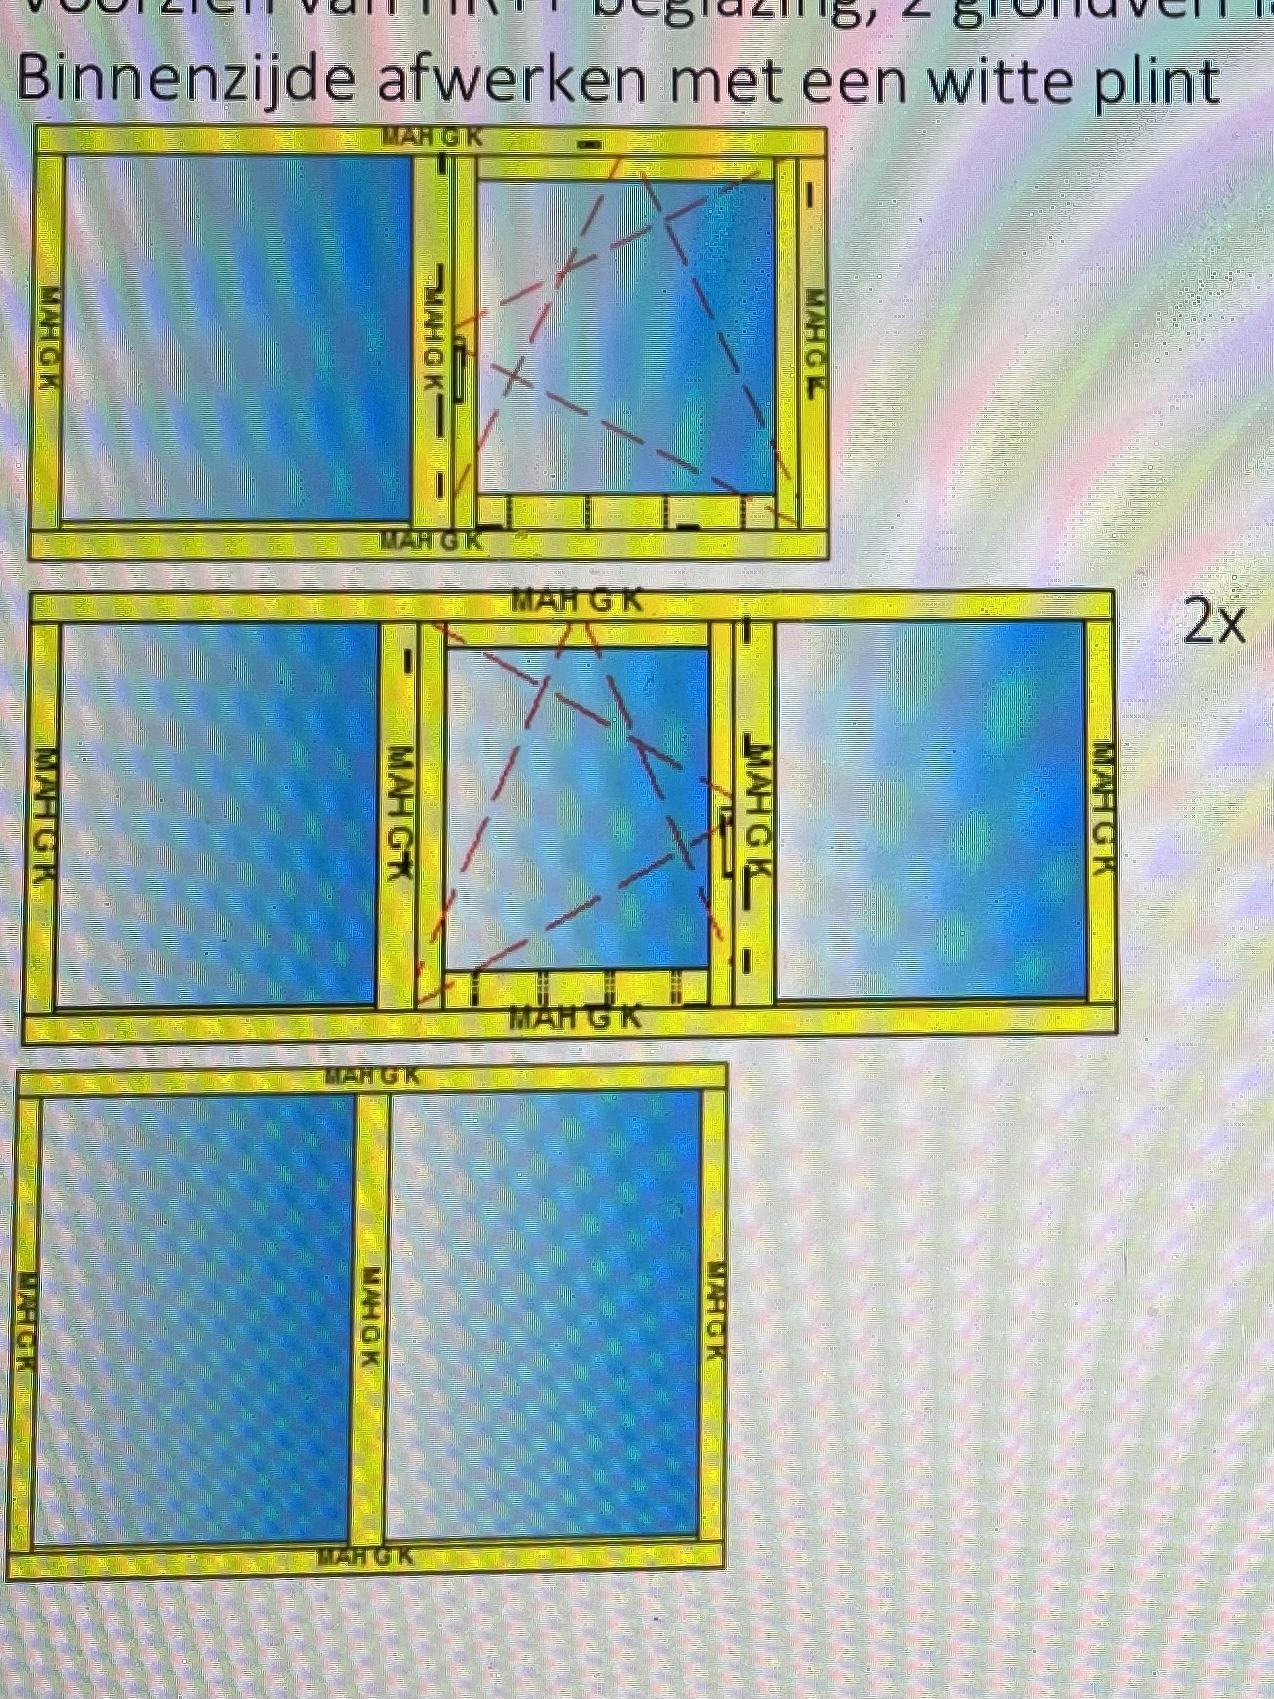 https://tweakers.net/i/liVgE9B72CwF4tGppNFbl0Y01mg=/full-fit-in/4920x3264/filters:max_bytes(3145728):no_upscale():strip_icc():fill(white):strip_exif()/f/image/fPfvn2MsoZbaWc5WF0lxpsrX.jpg?f=user_large